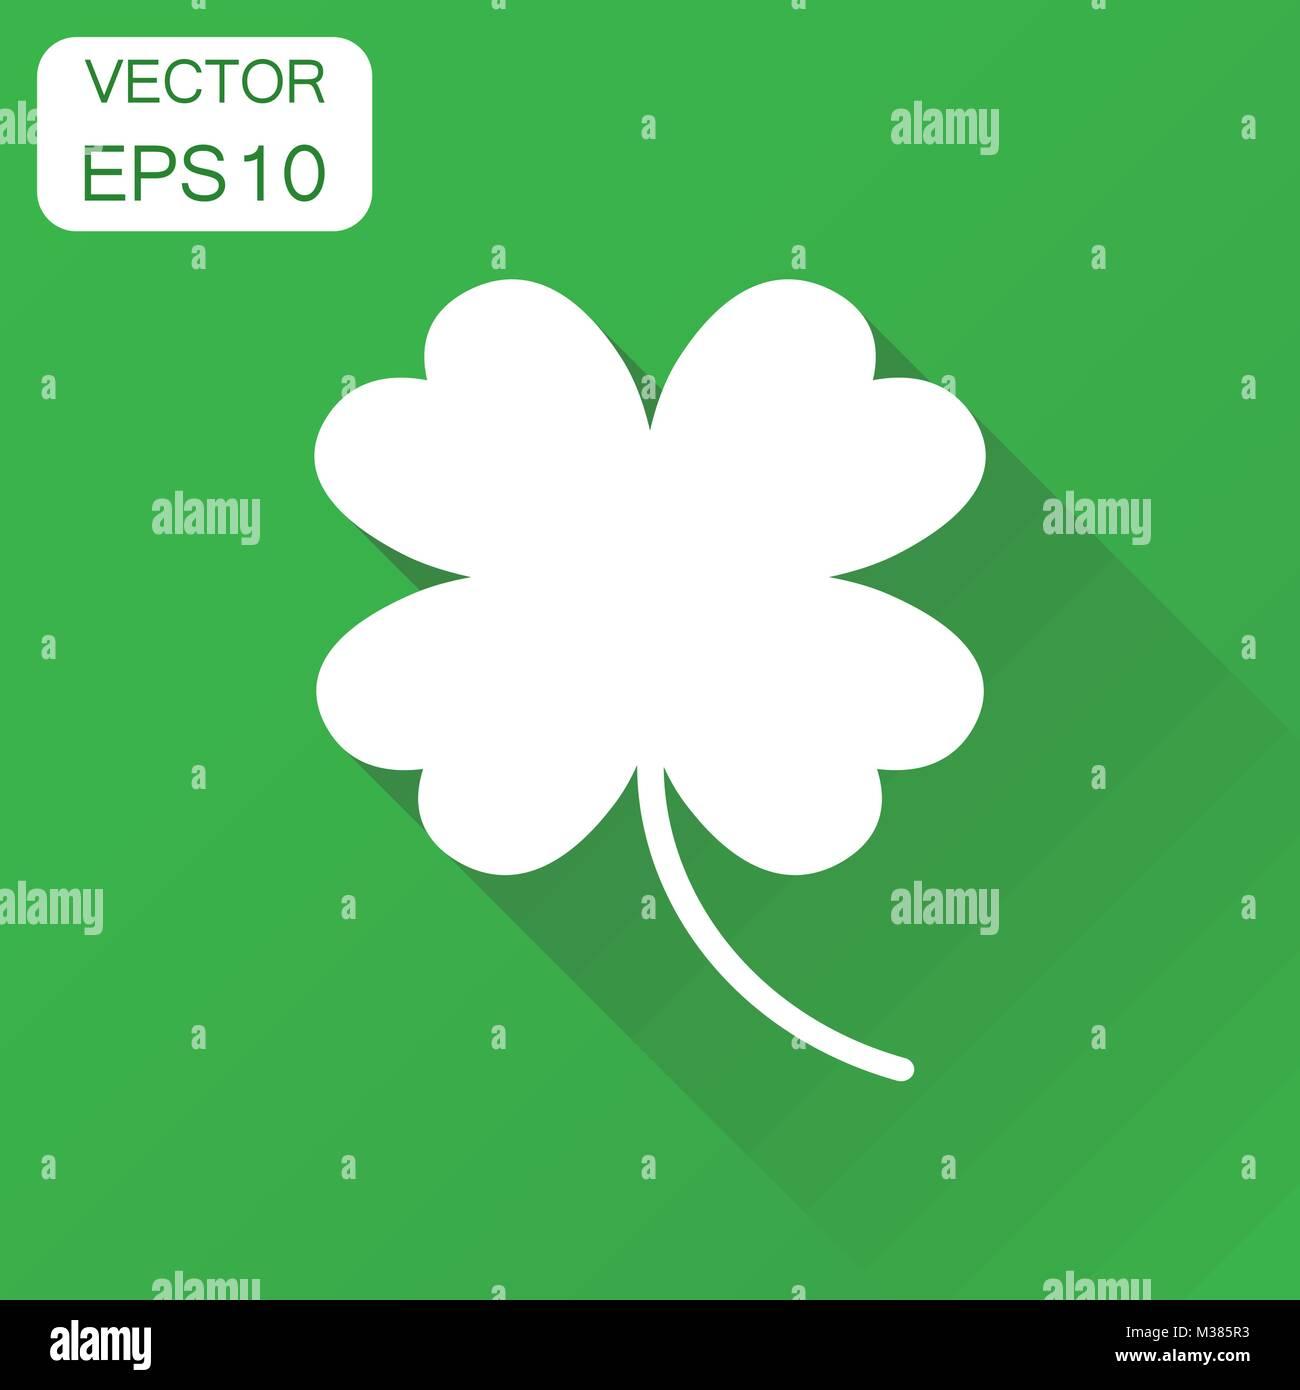 Irish Vector Vectors Imágenes De Stock & Irish Vector Vectors Fotos ...